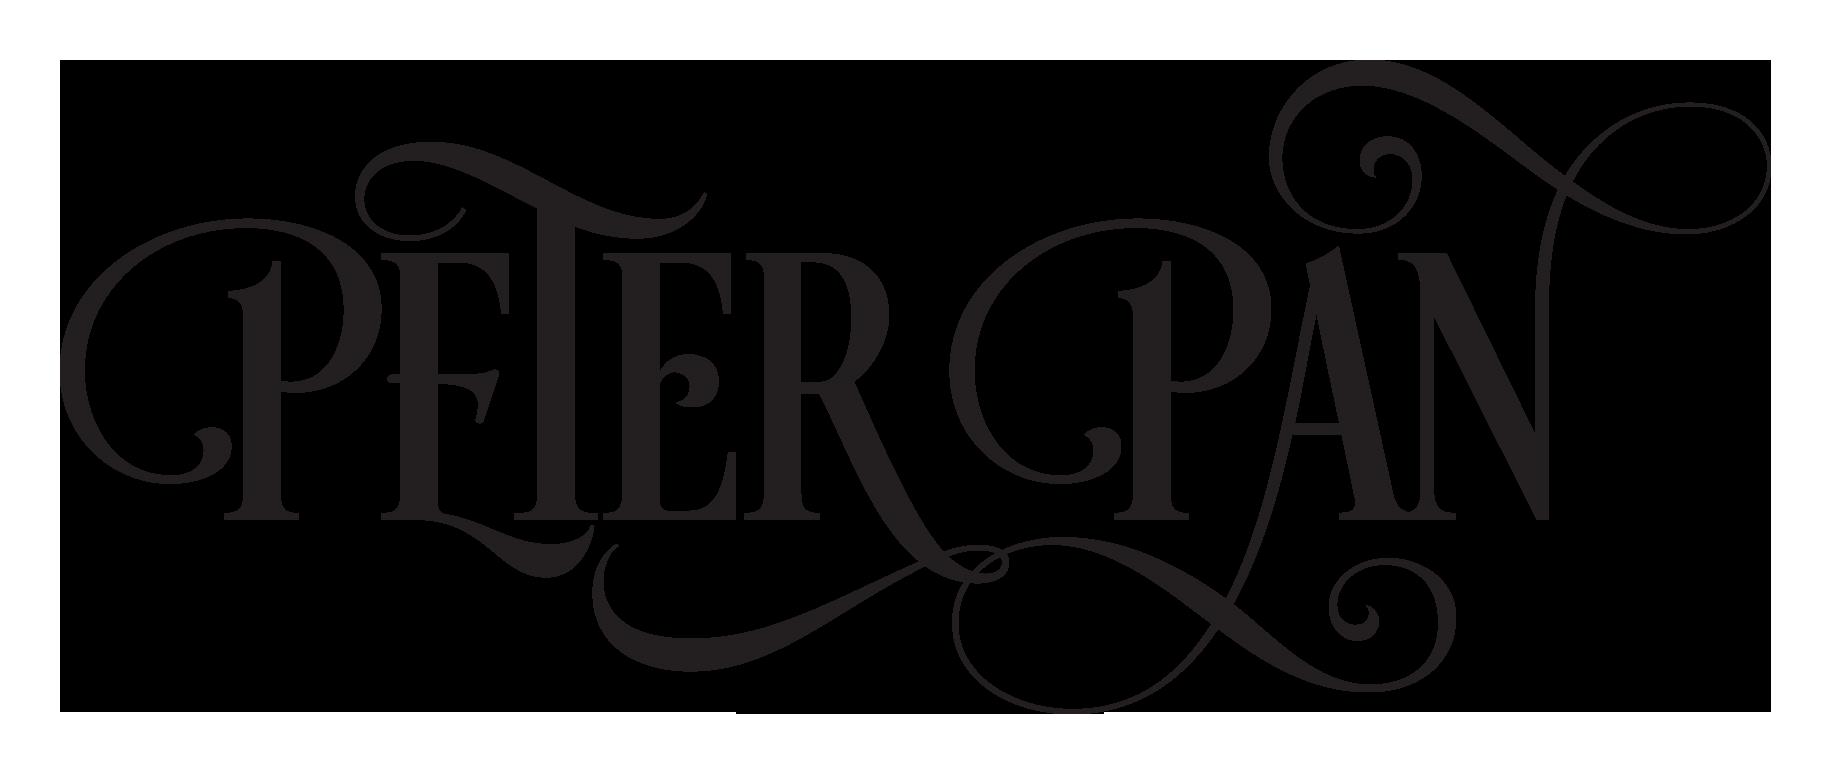 Nashville Ballet's Peter Pan